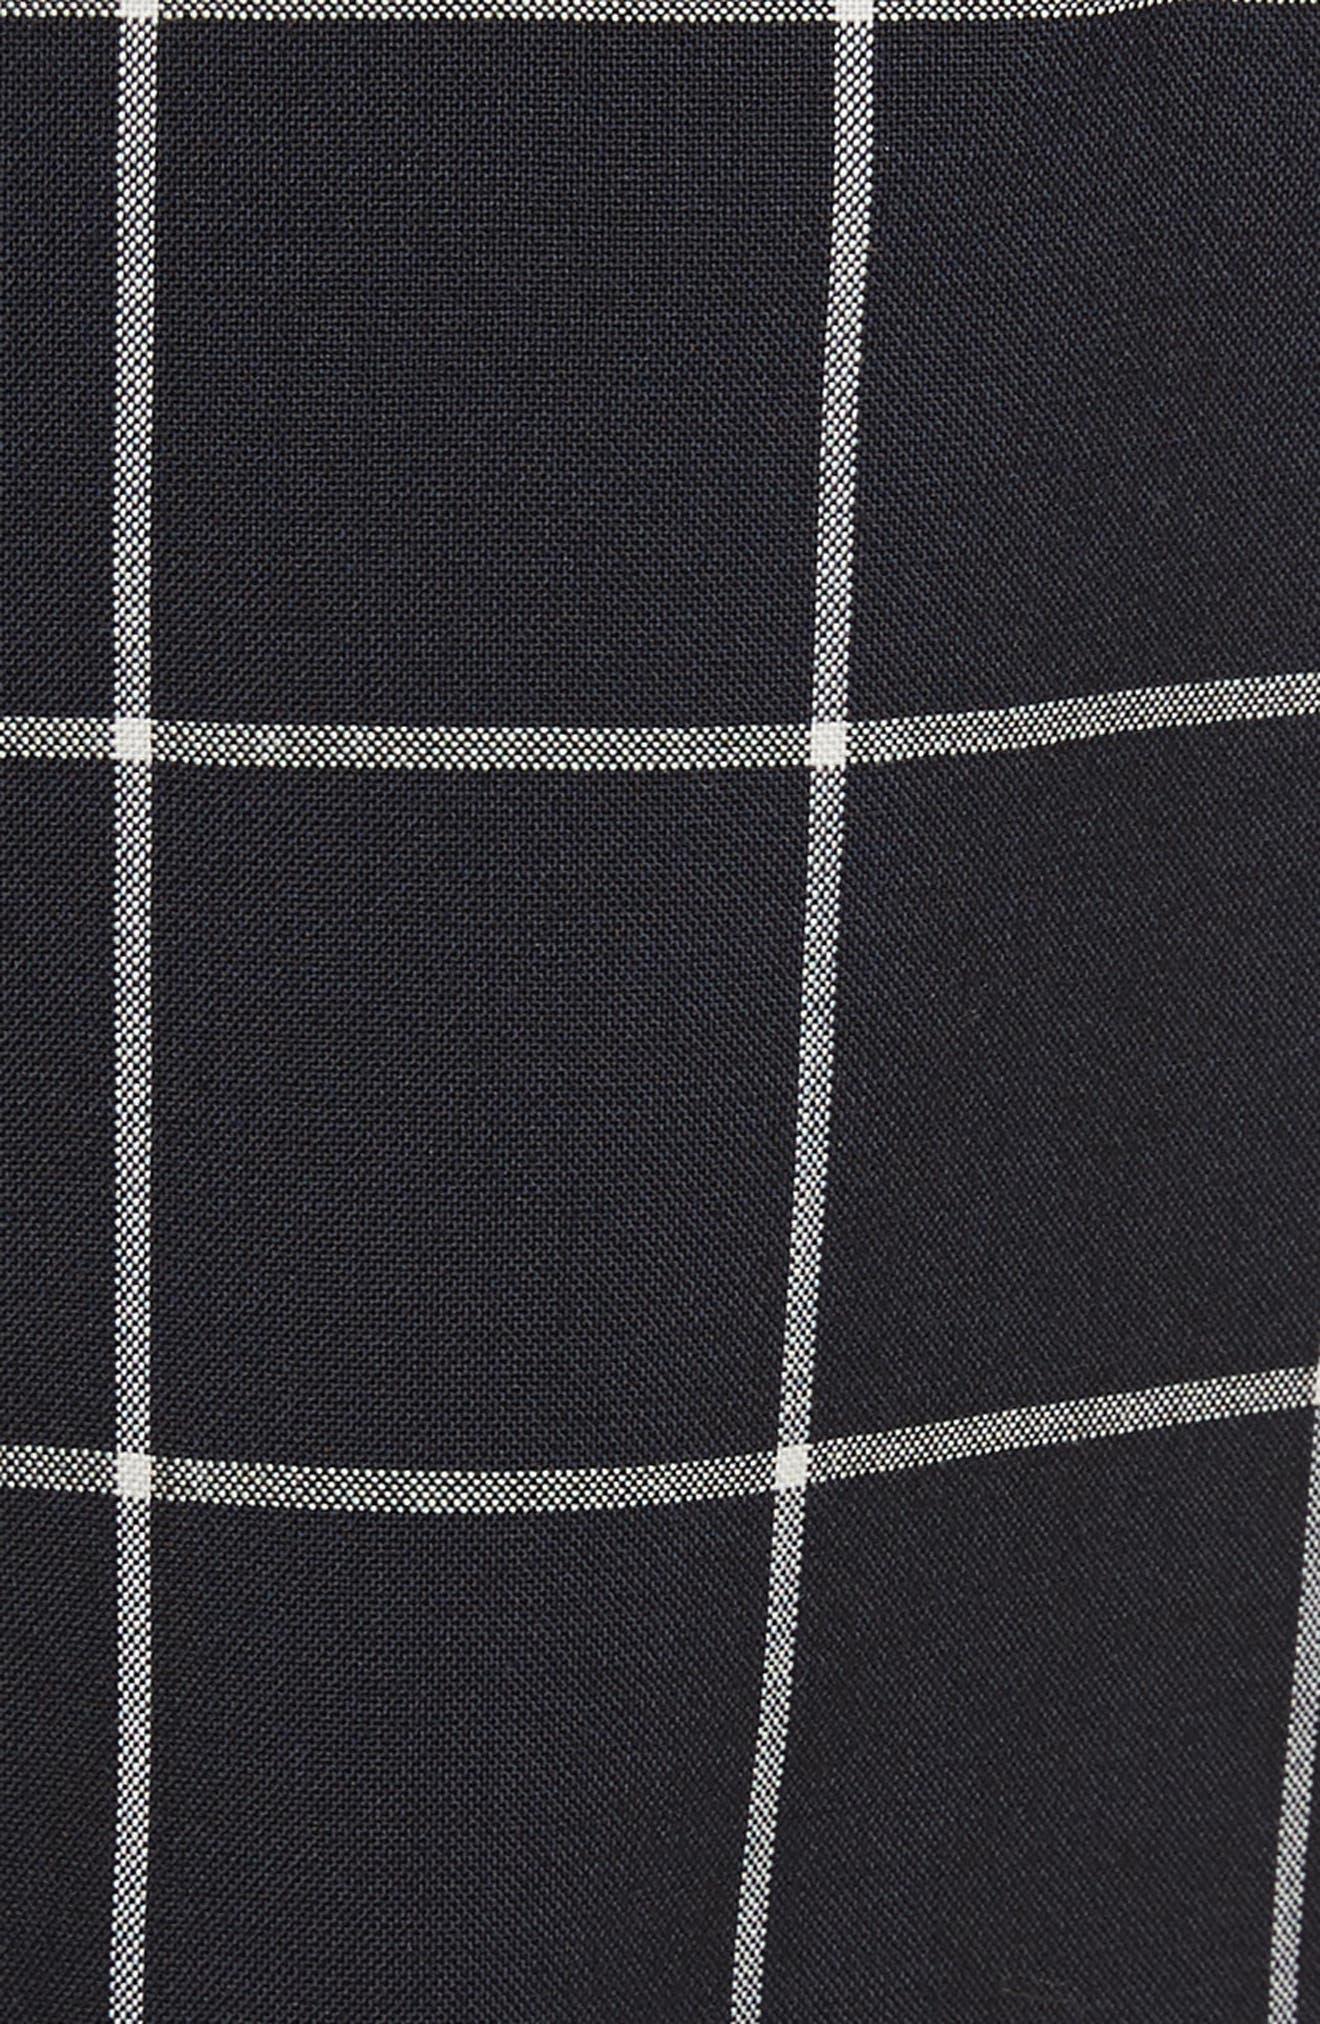 Peekaboo Windowpane Plaid Wool Shorts,                             Alternate thumbnail 5, color,                             435